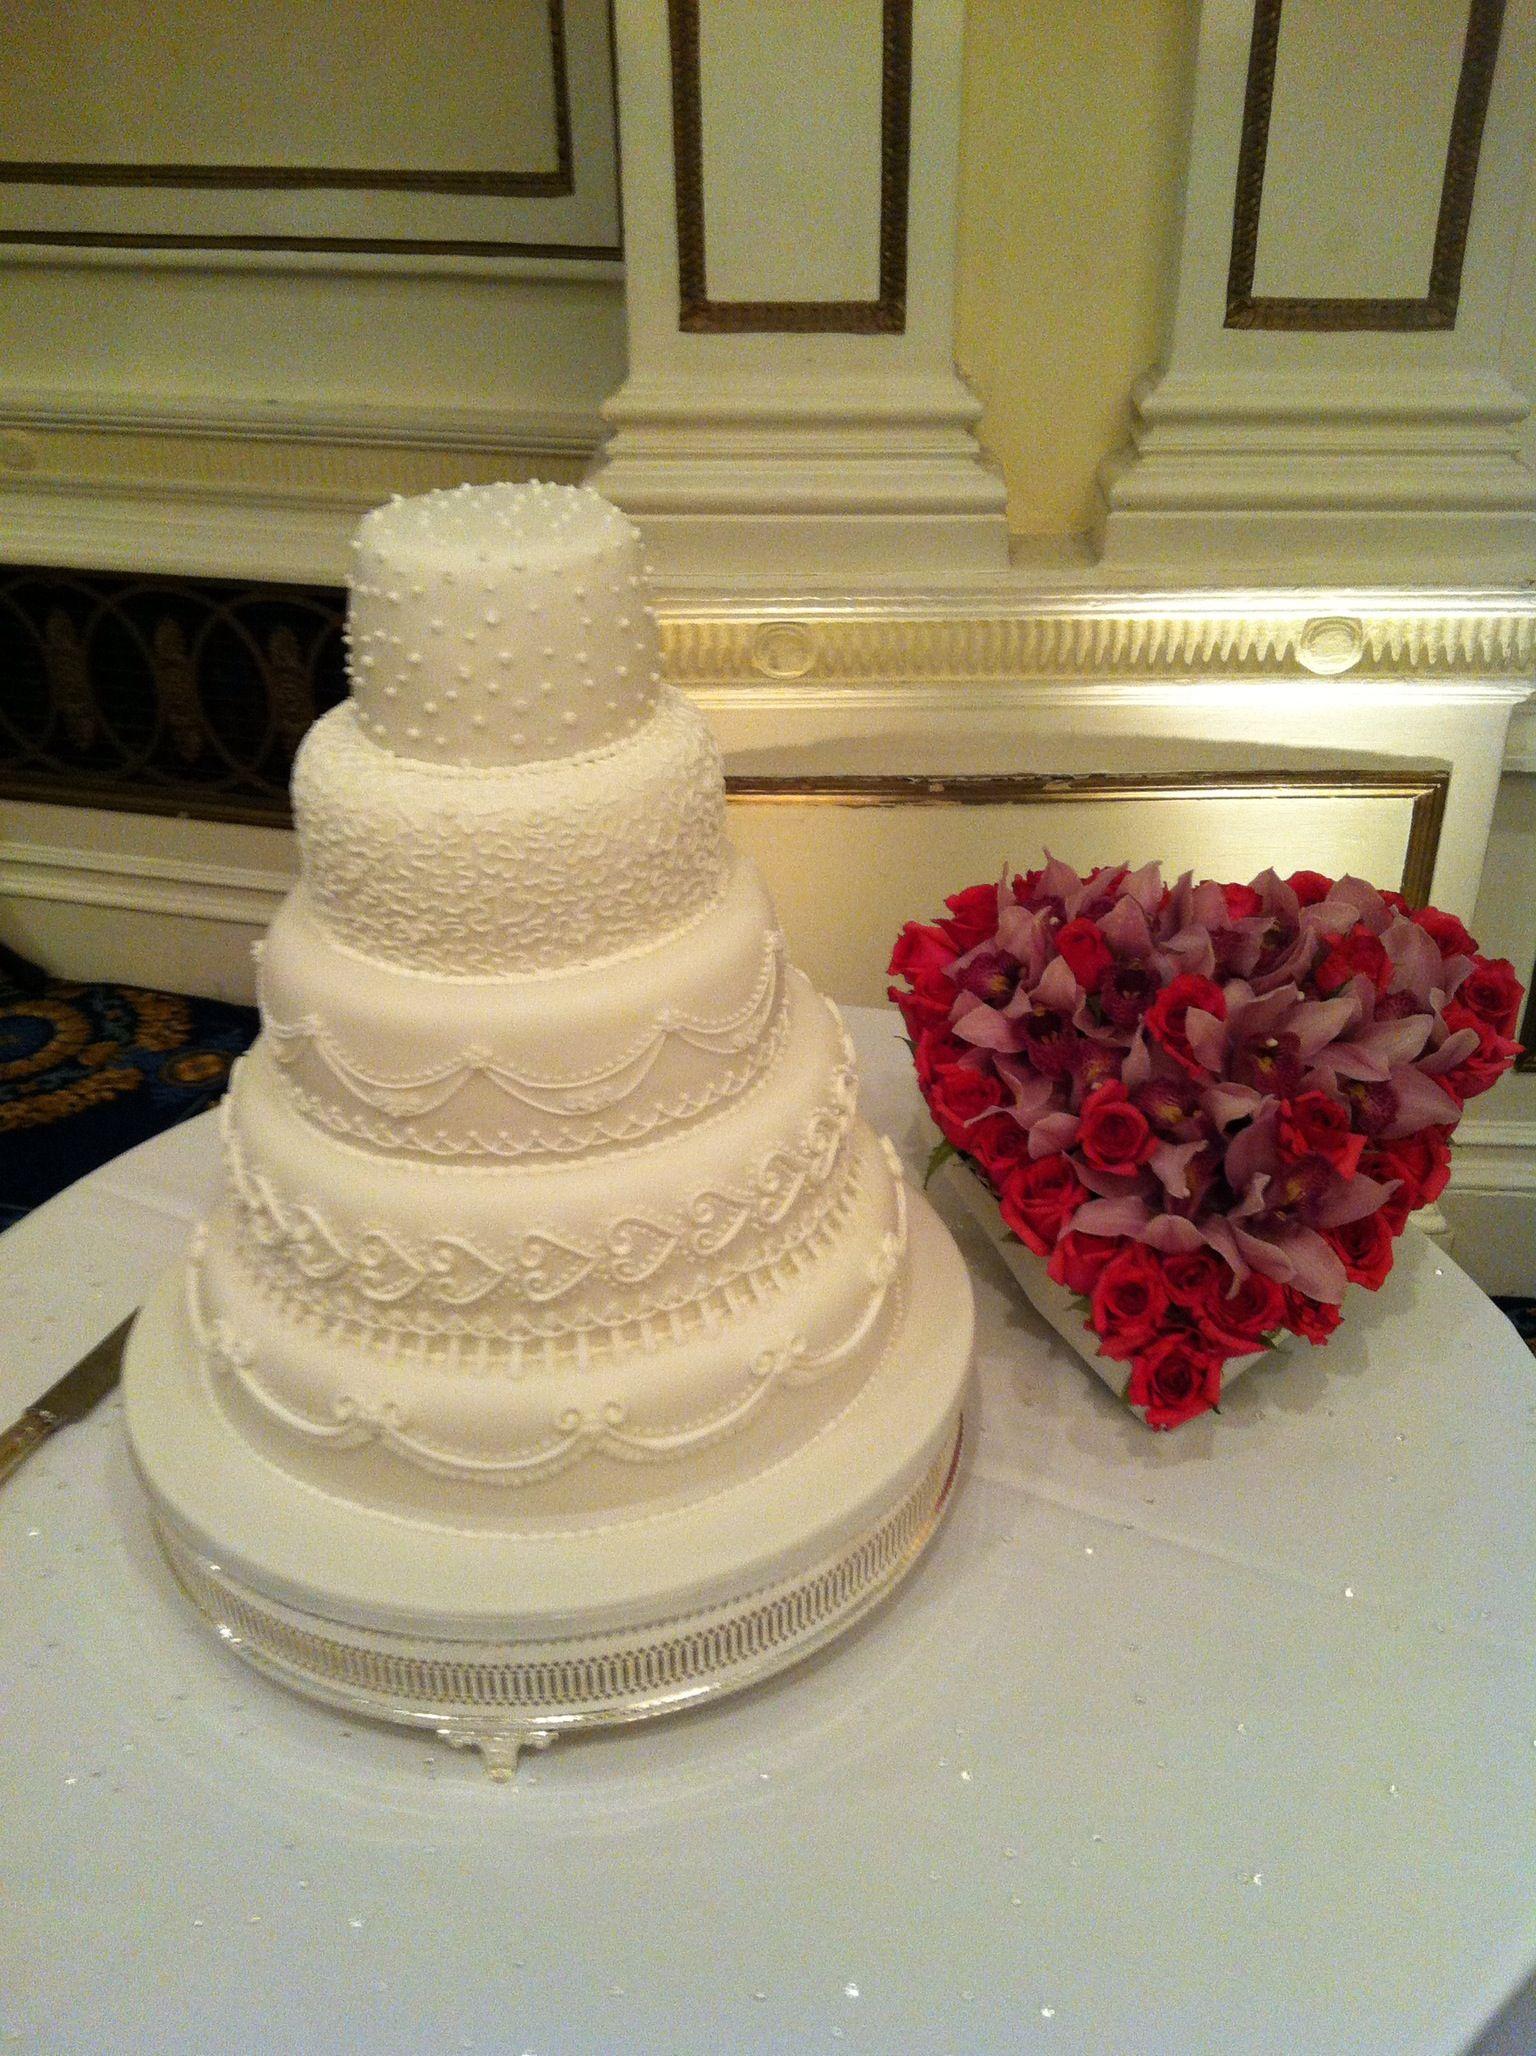 5 Tier Wedding Cake   Cakes   Pinterest   Tier wedding cakes ...